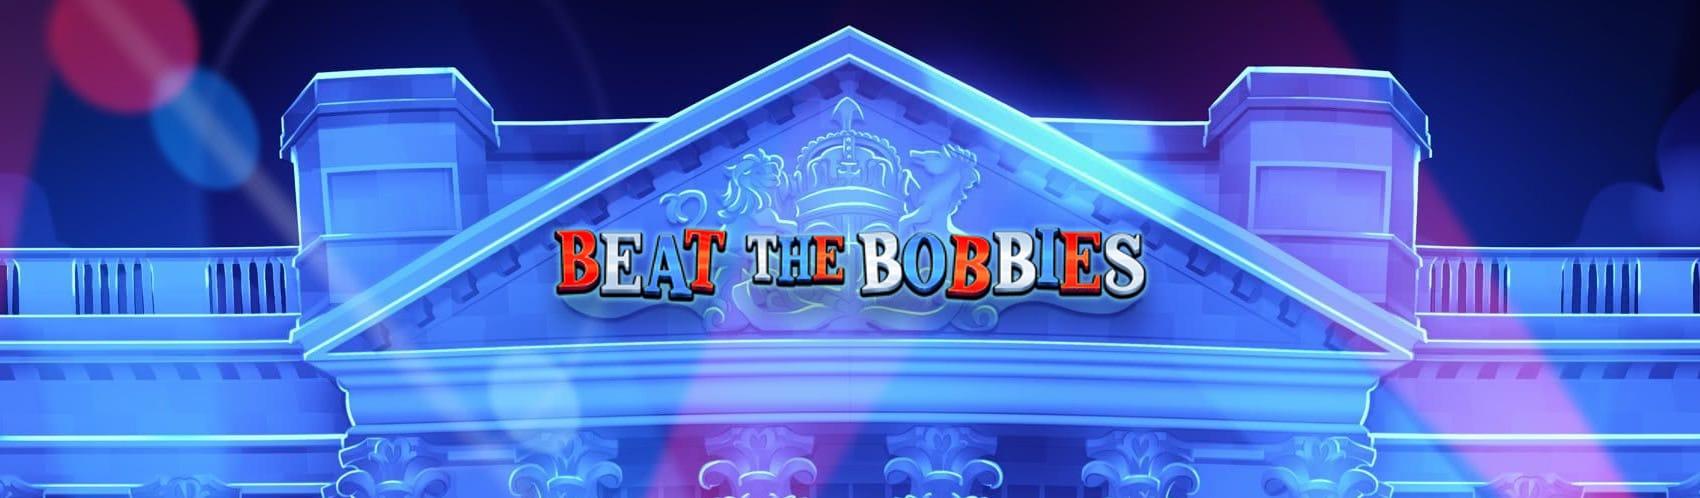 Beat the Bobbies Slot - DaisySlots